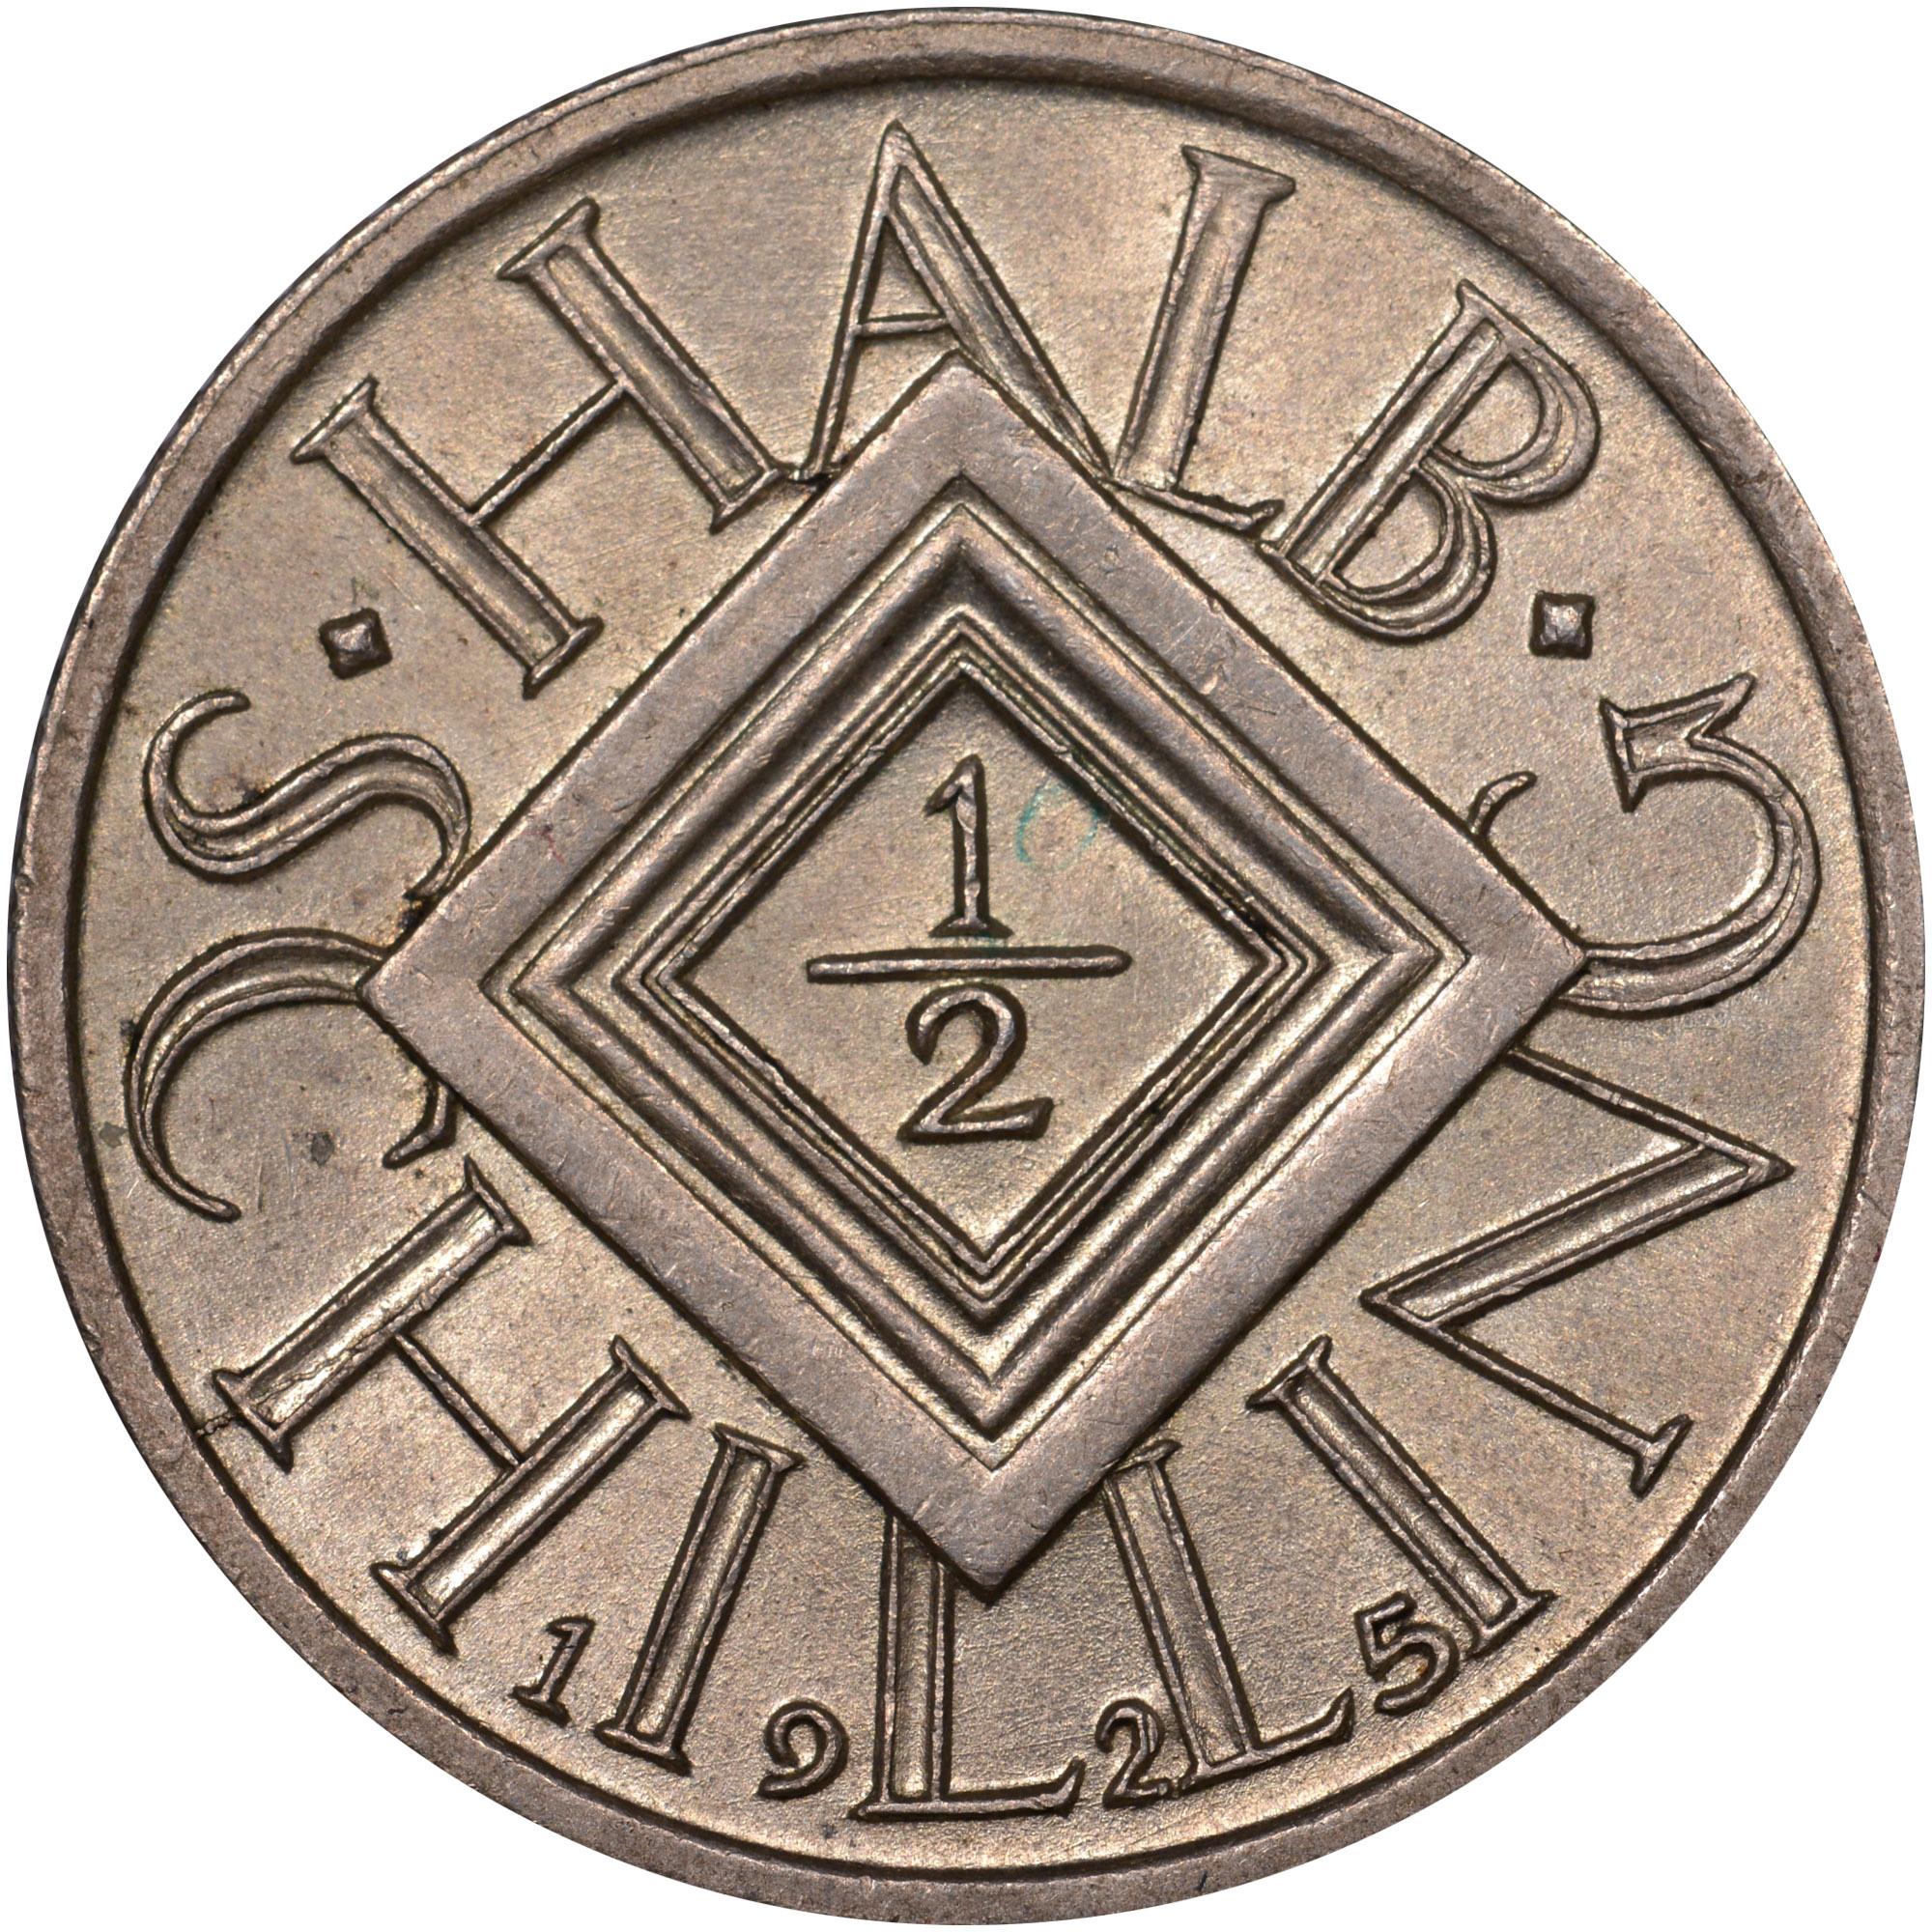 1925-1926 Austria 1/2 Schilling reverse